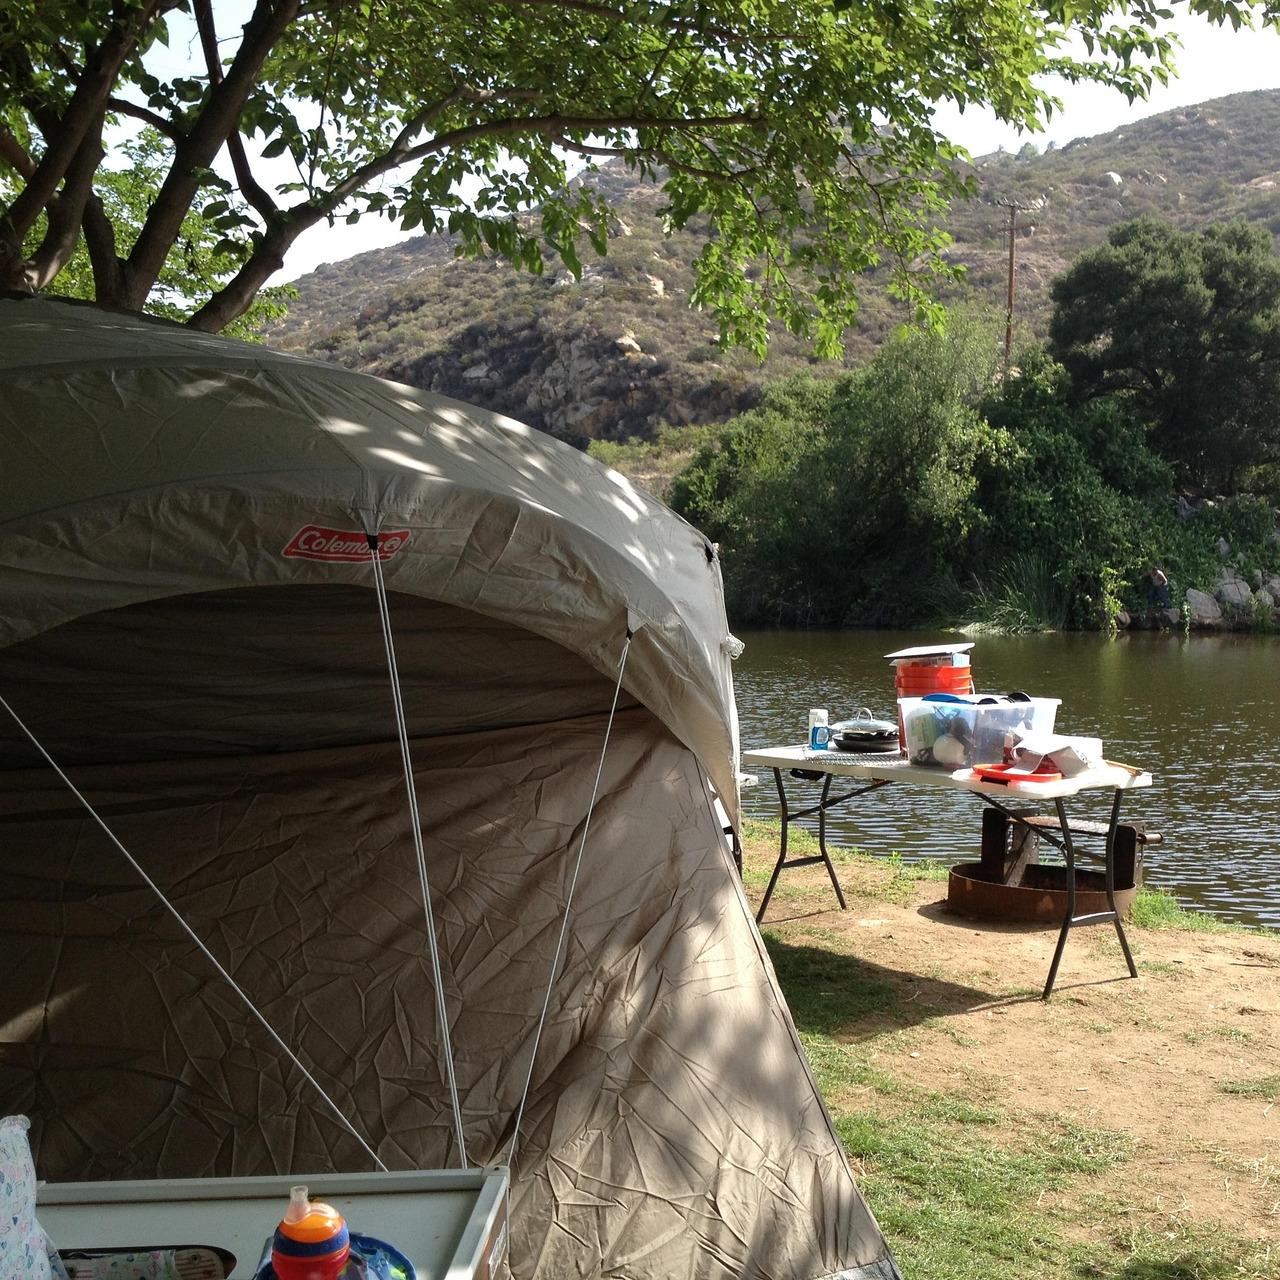 All Seasons Rv >> All Seasons Rv Park Campground Reviews Escondido Ca